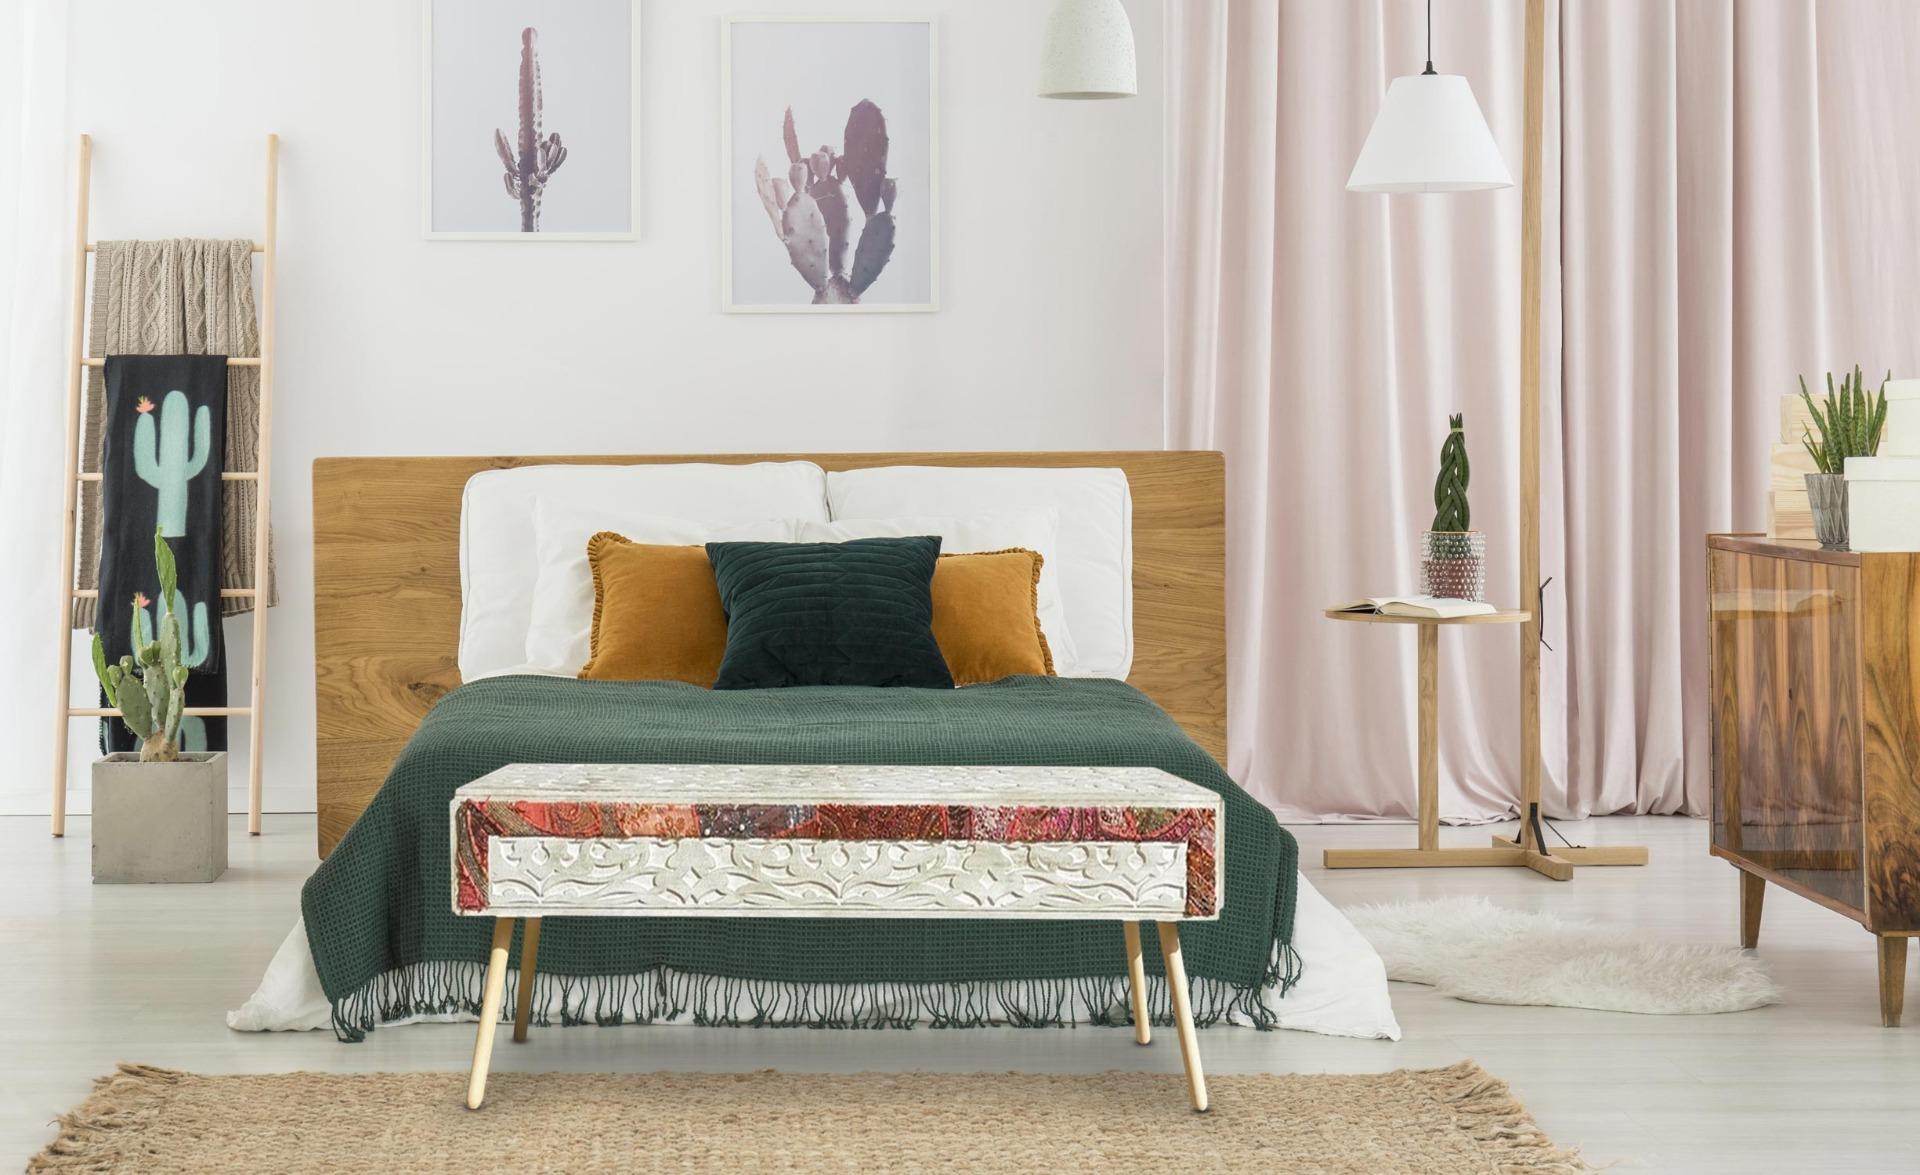 Bout de lit Jadida Blanc et Tissu